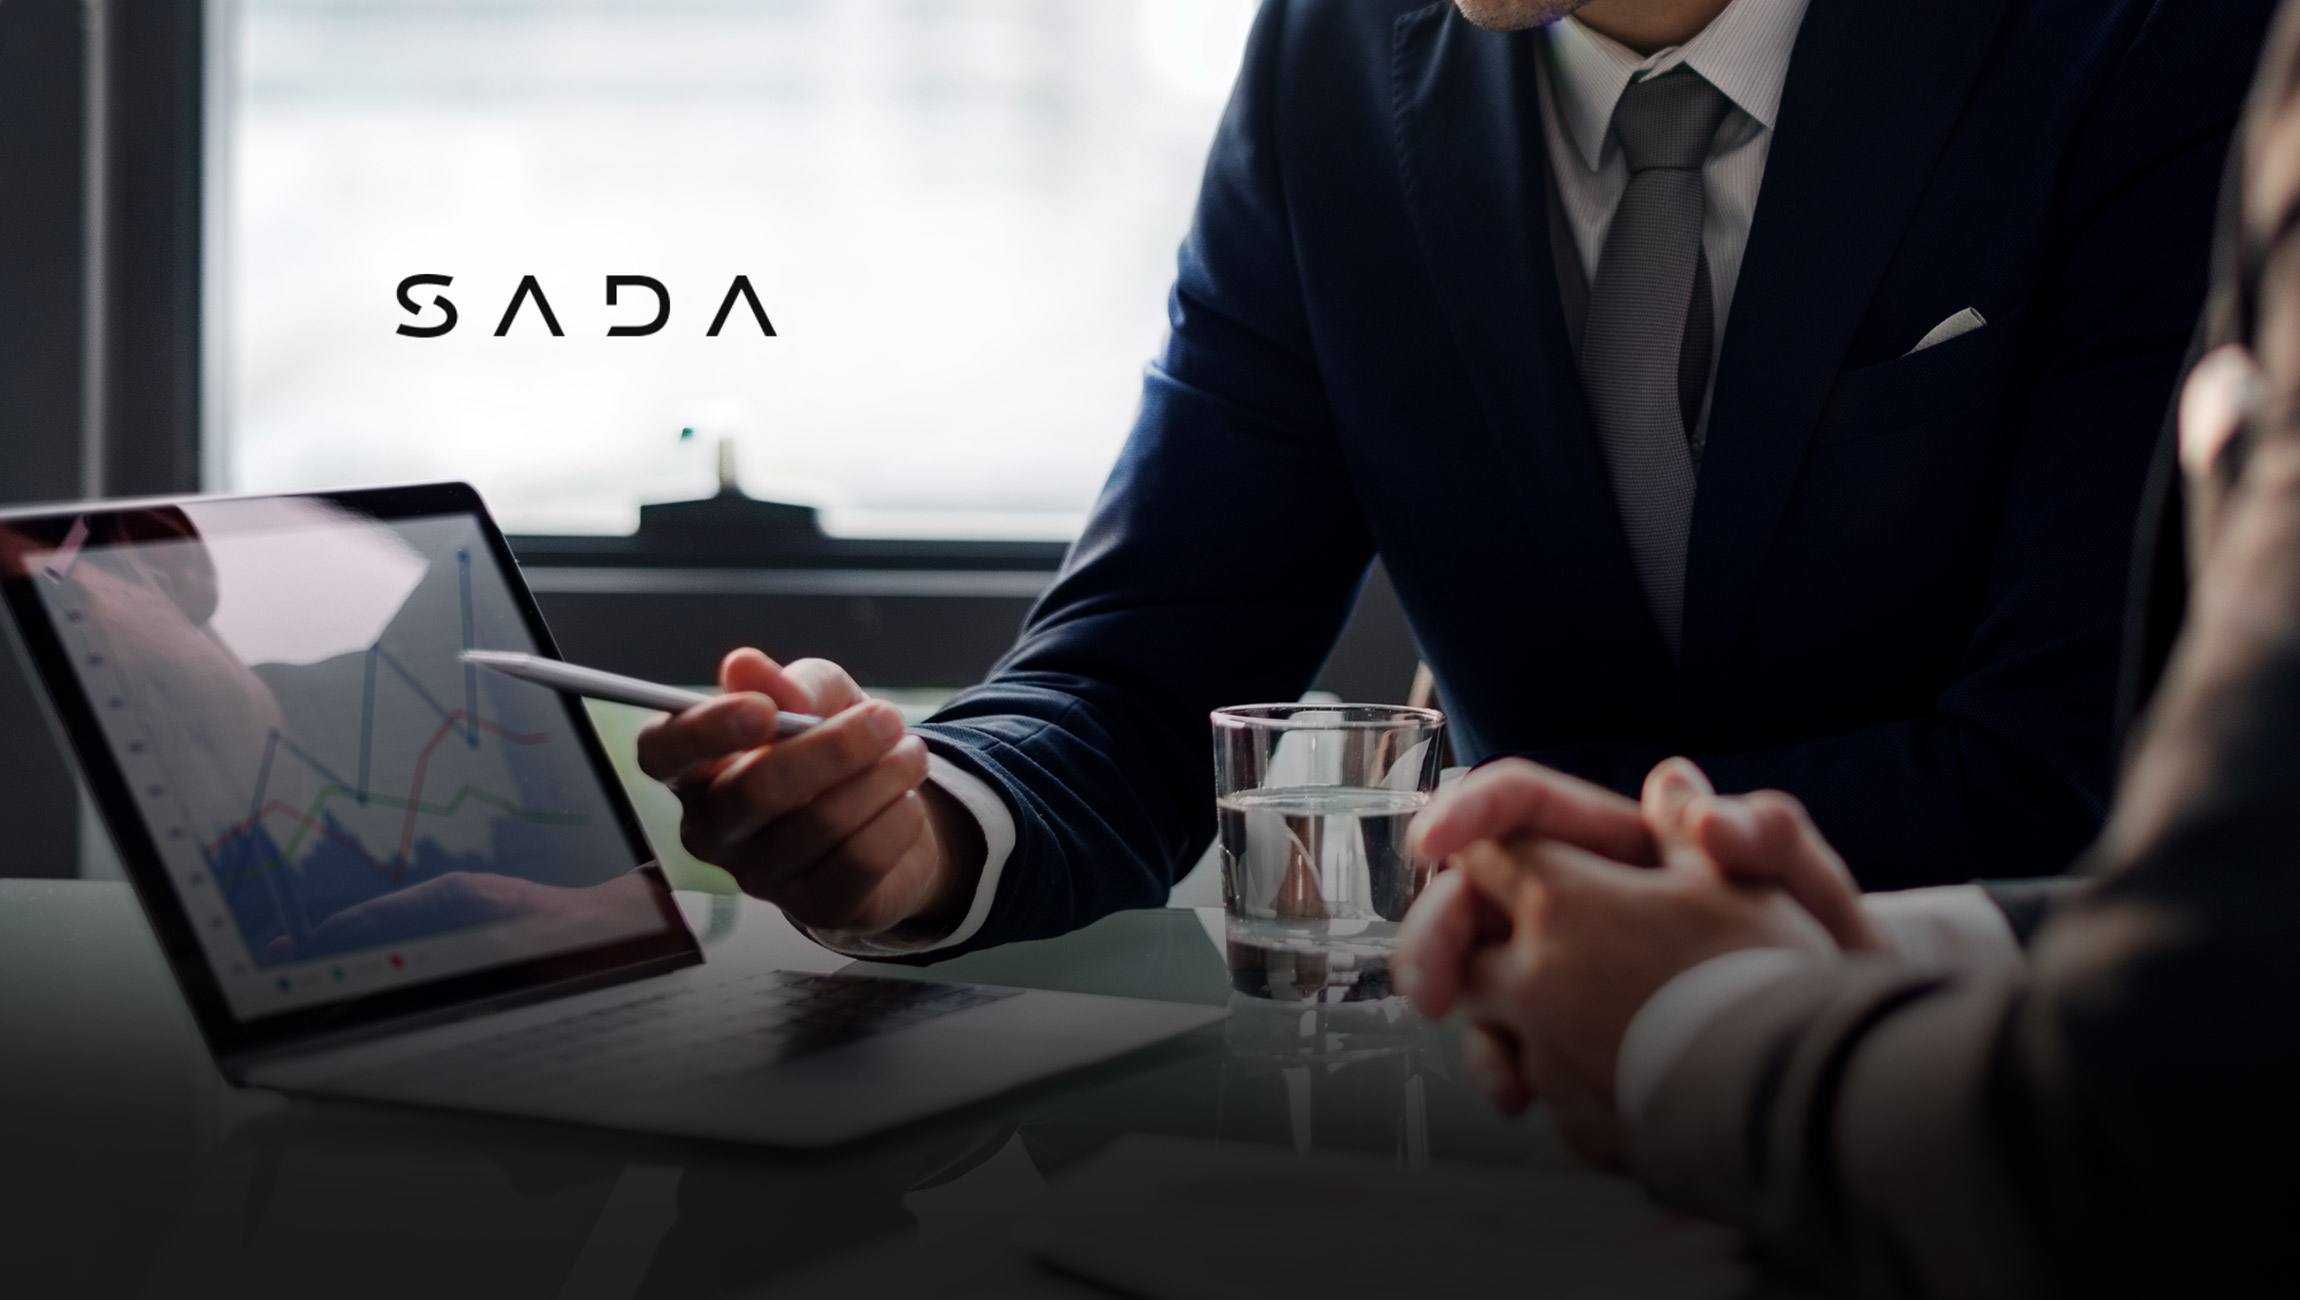 SADA Helps Evite Achieve Triple Digit Growth